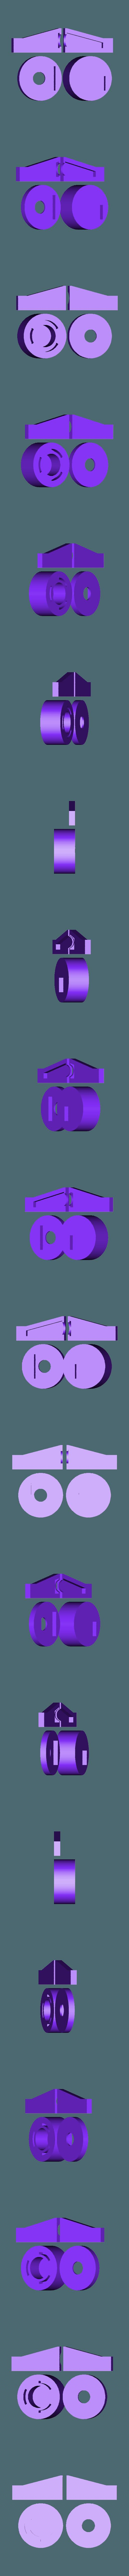 sharpener_drum.stl Download free STL file Coffee Grinder • 3D printer template, Wachet